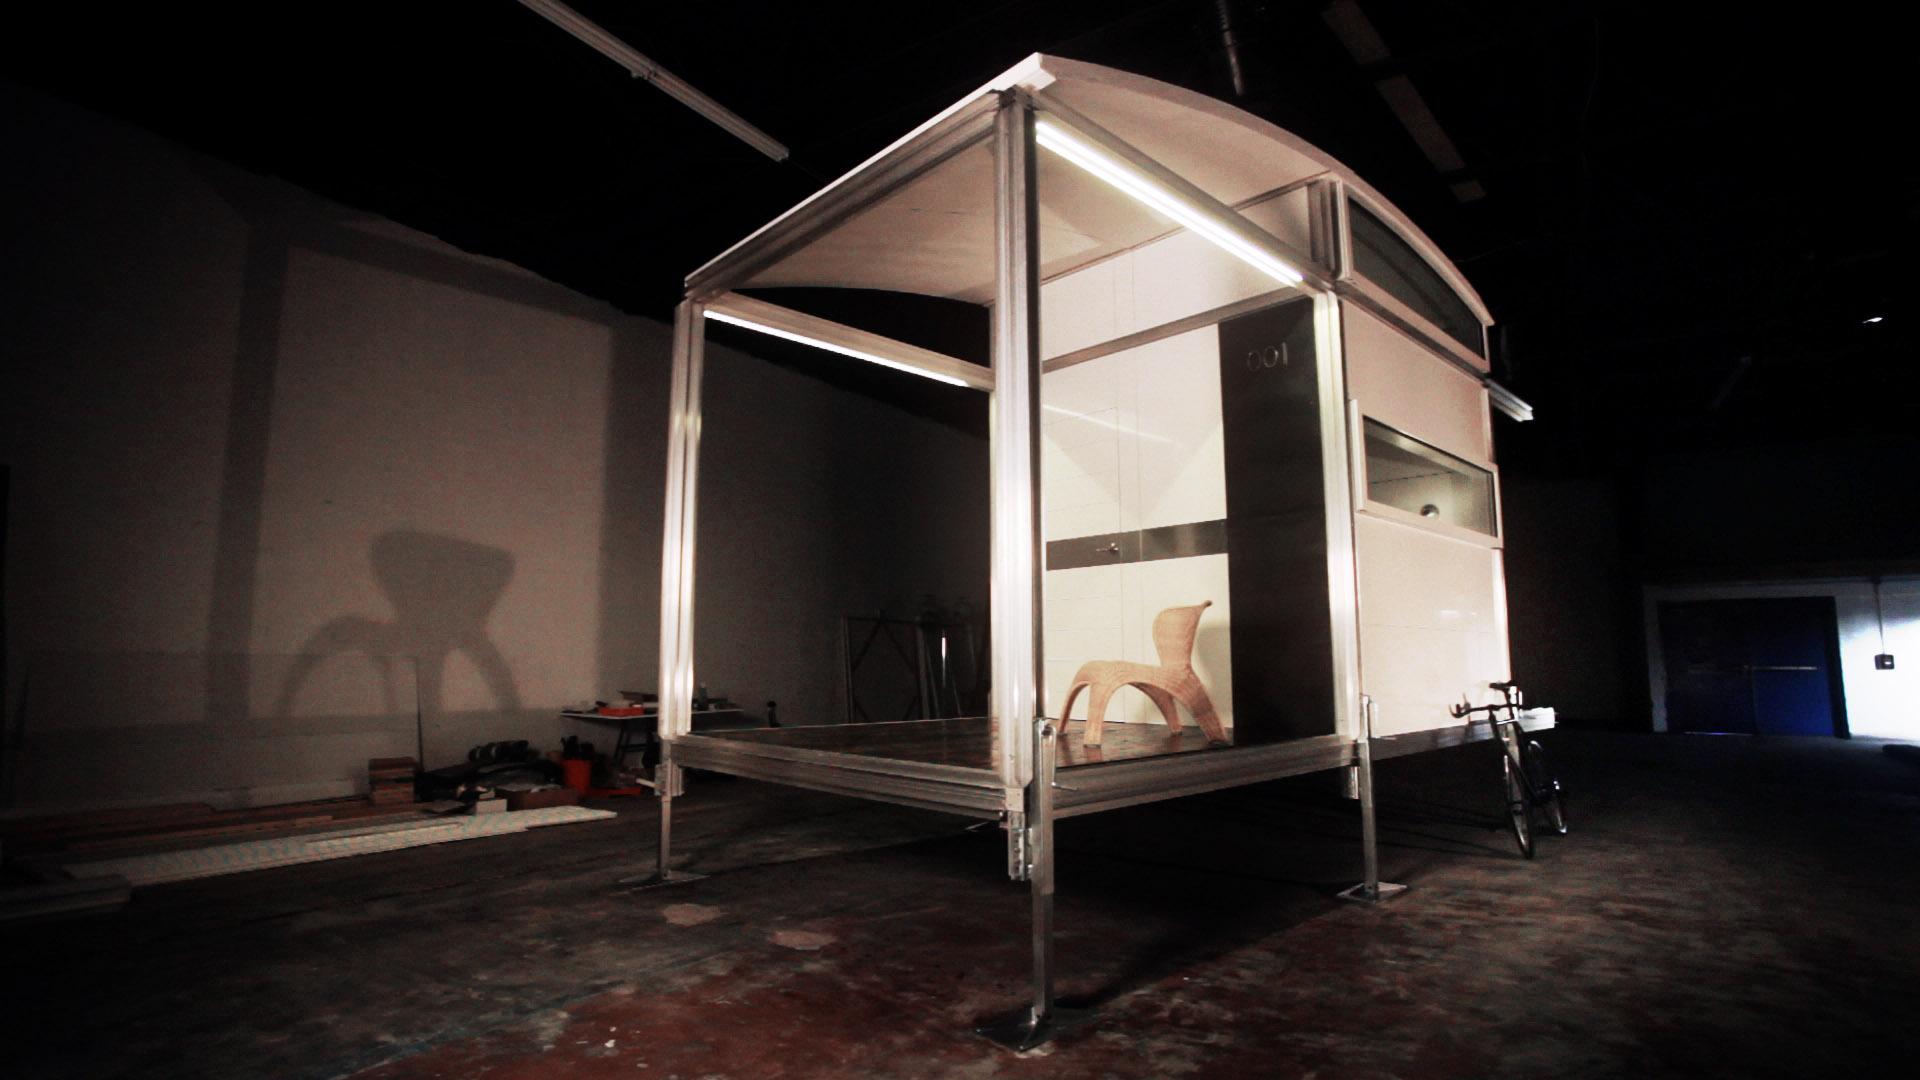 AbleNook – Rapidly Deployable Modular Dwelling